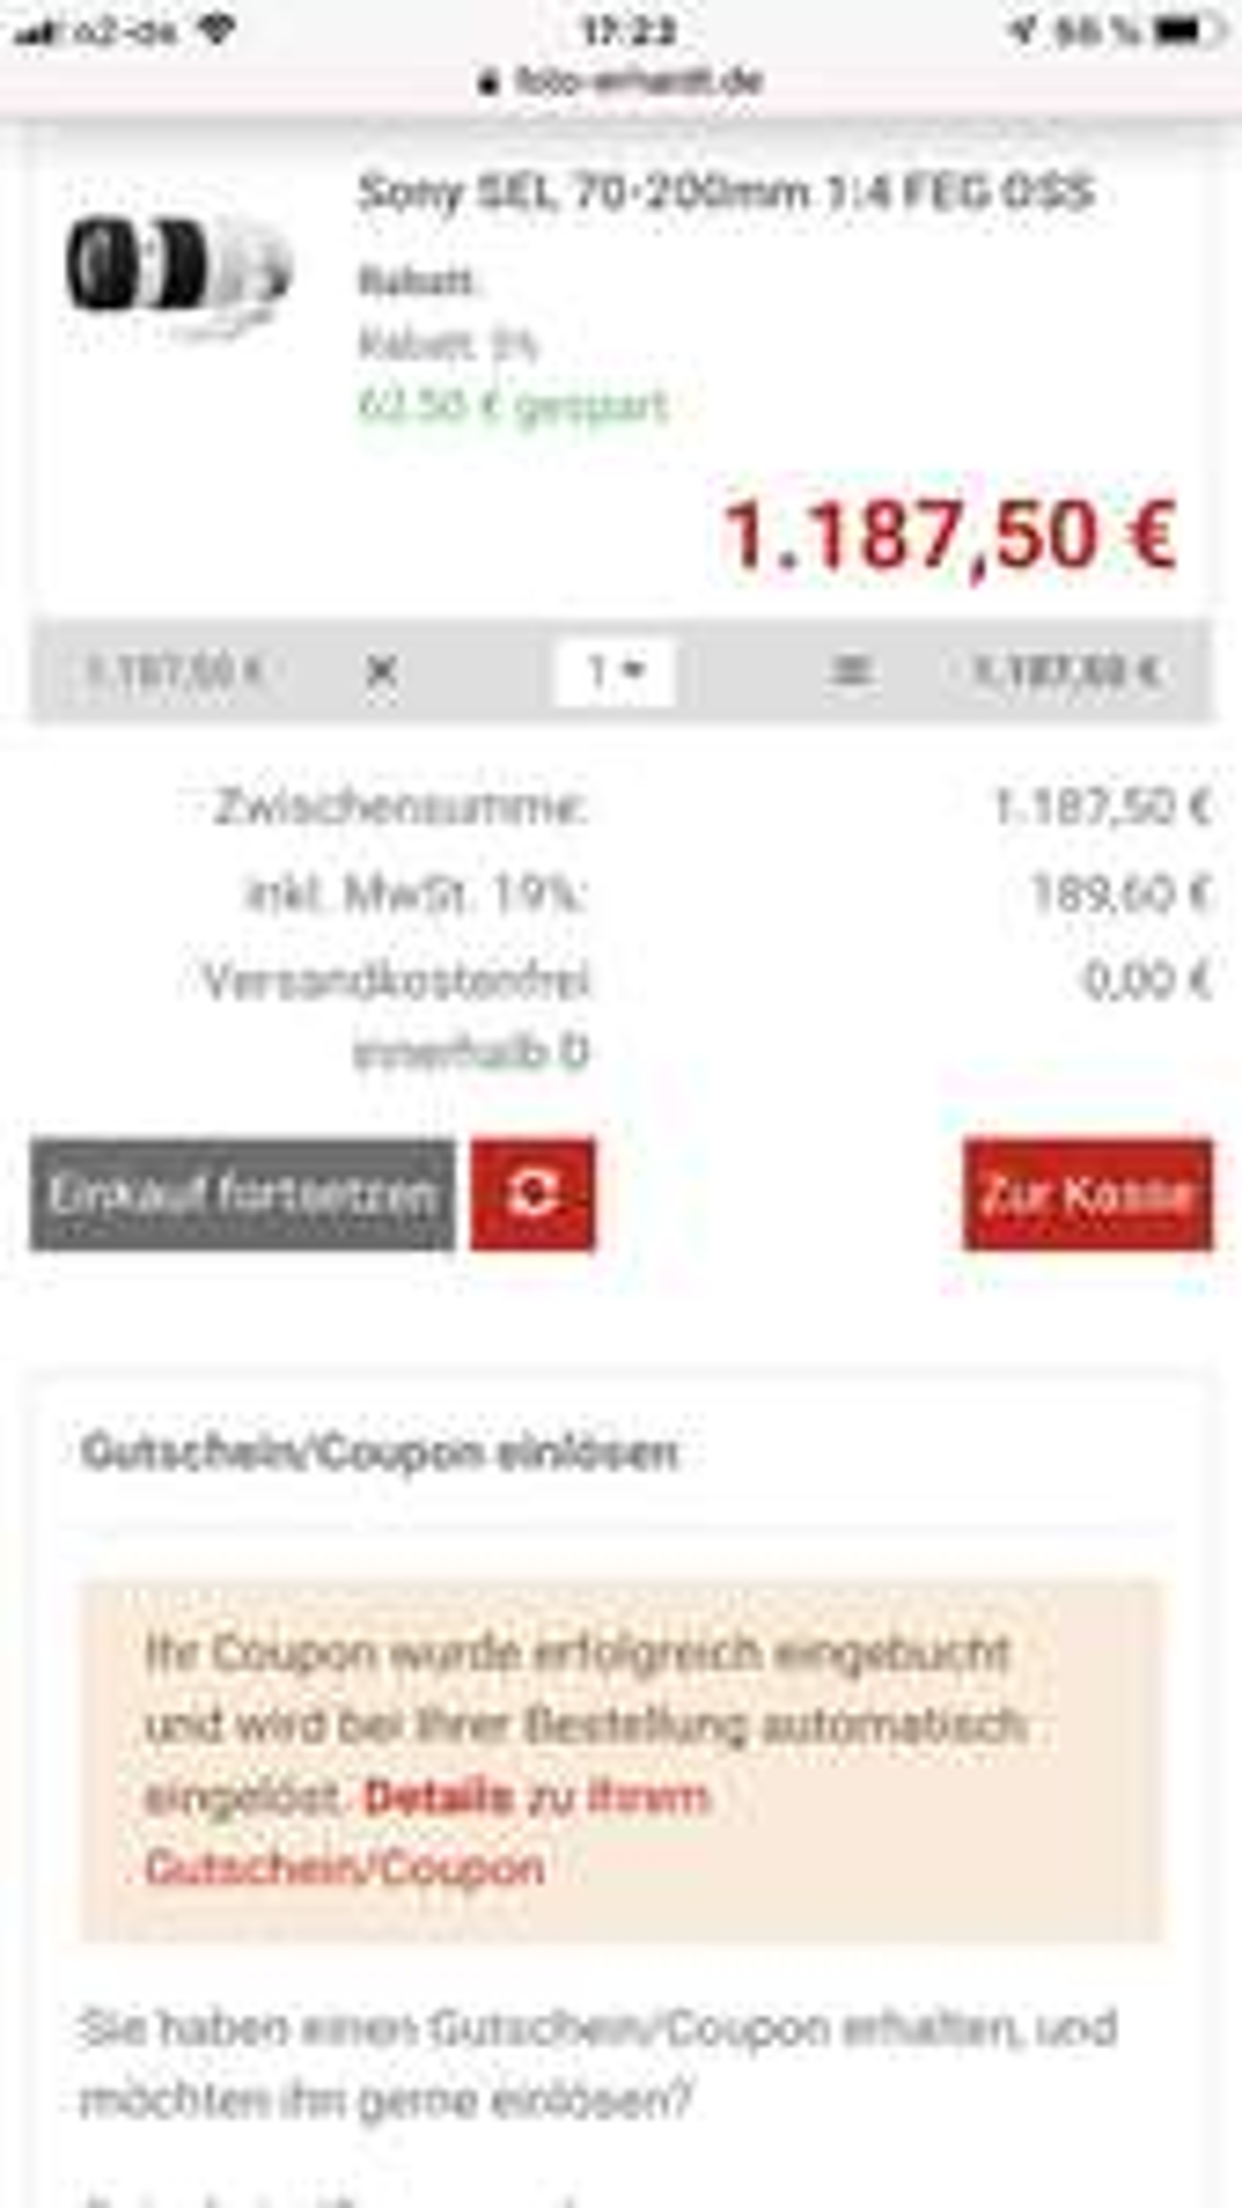 Sony FE 70-200 f4 Für 1087,50€